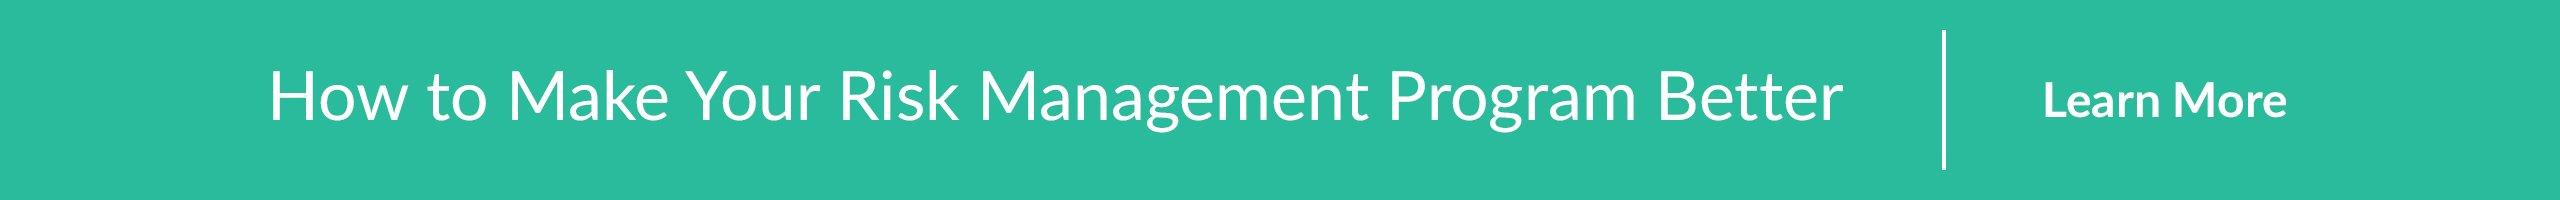 how to make your risk management program better